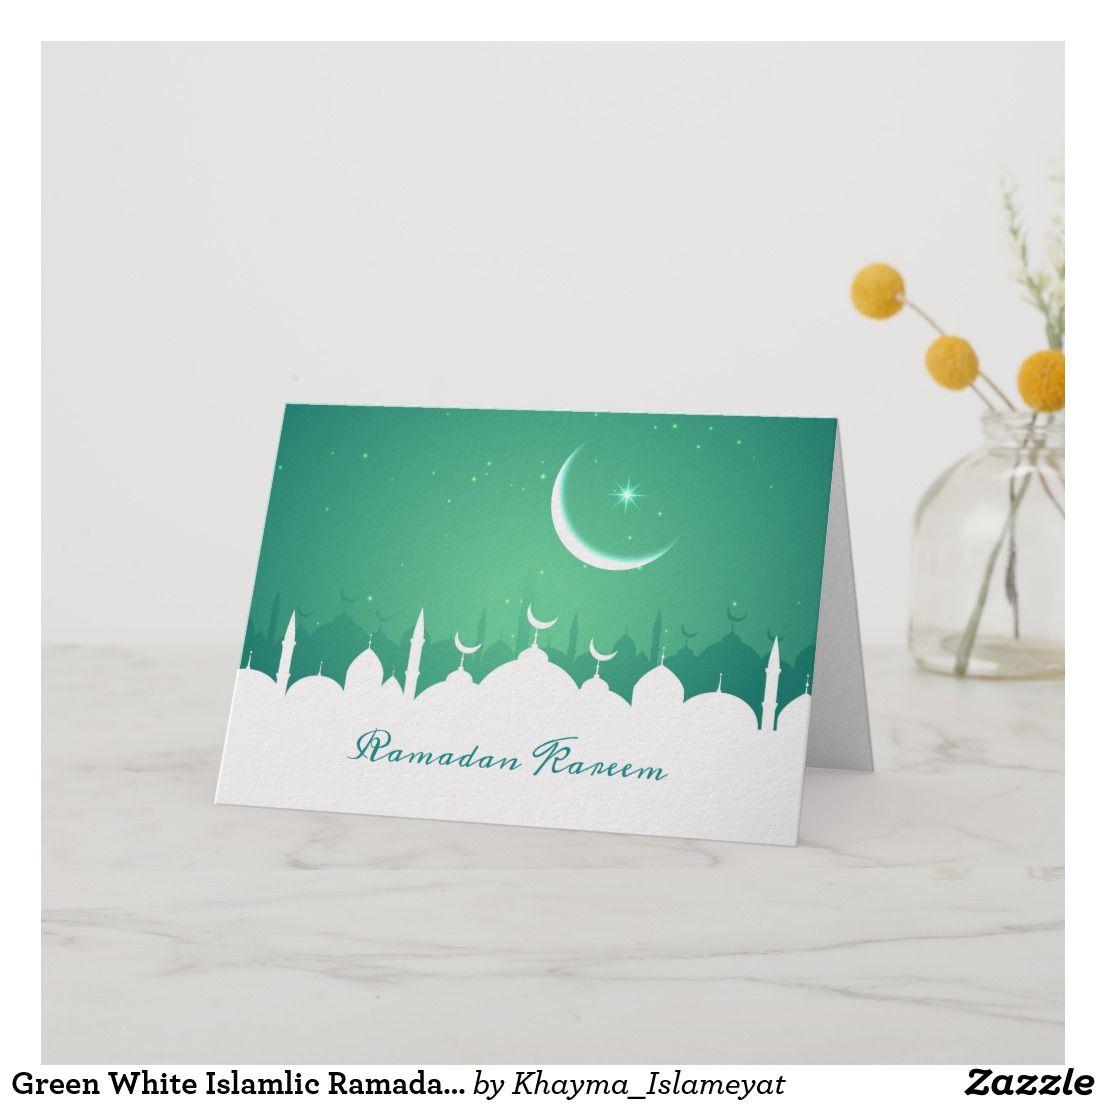 green white islamlic ramadan kareem greeting card  zazzle